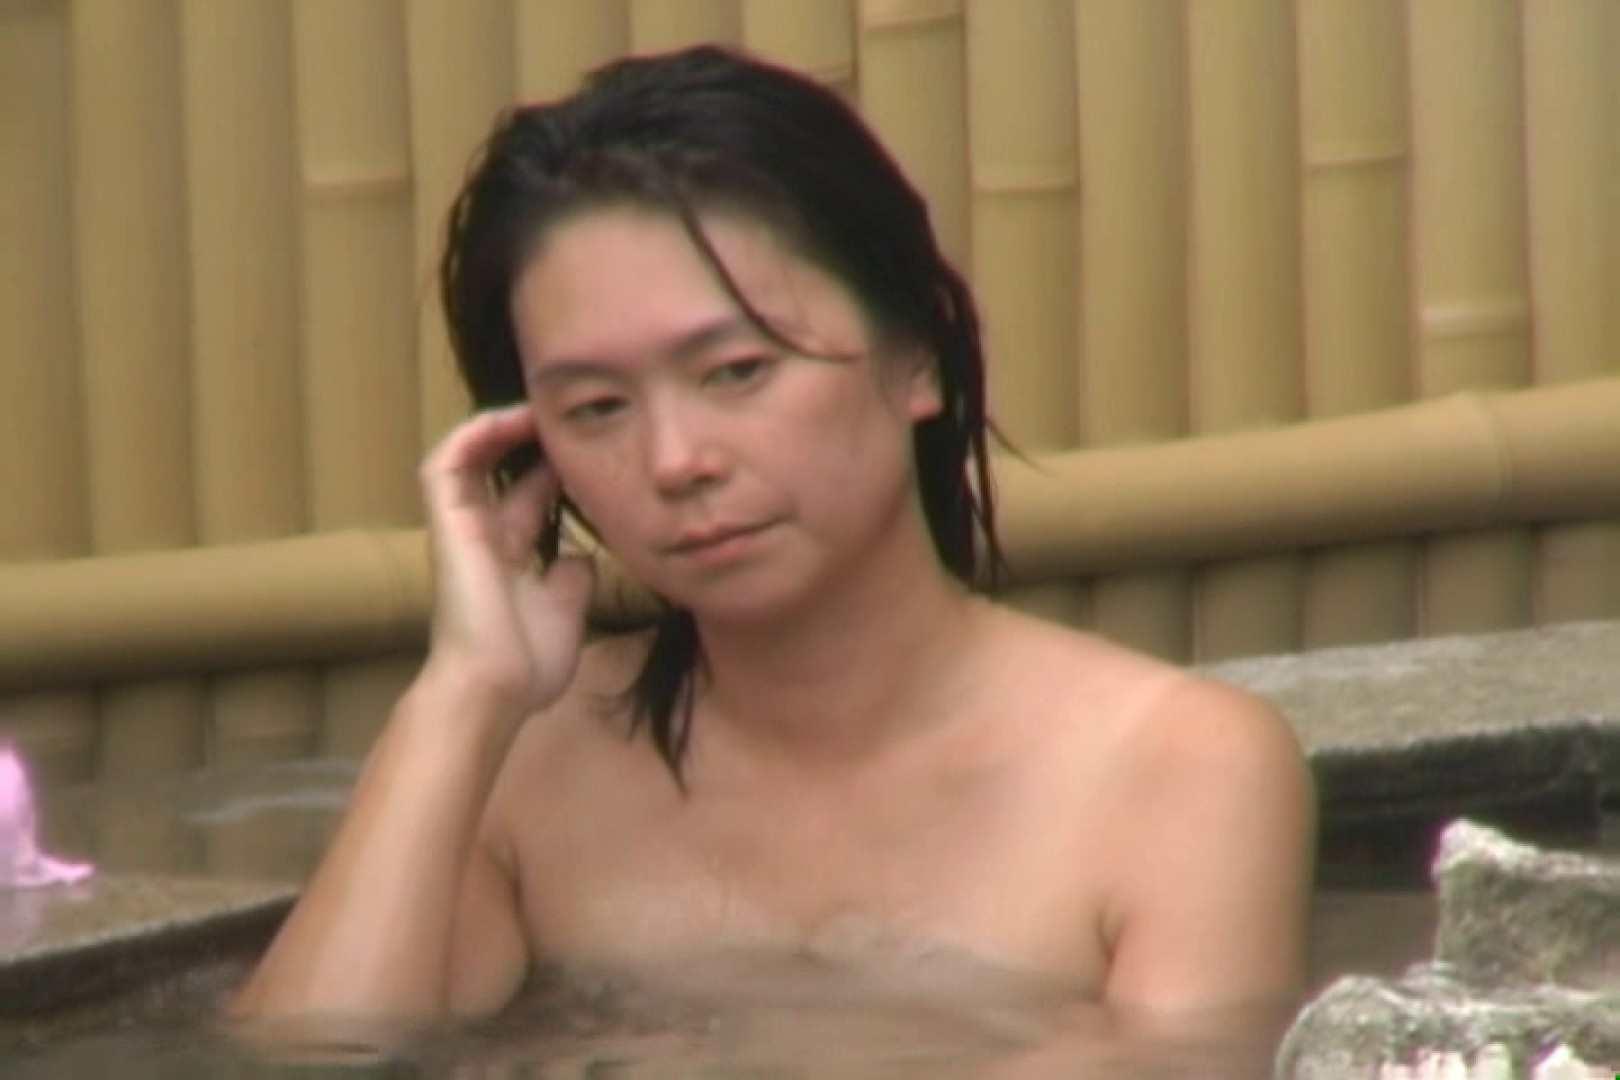 Aquaな露天風呂Vol.619 HなOL オマンコ動画キャプチャ 107pic 52